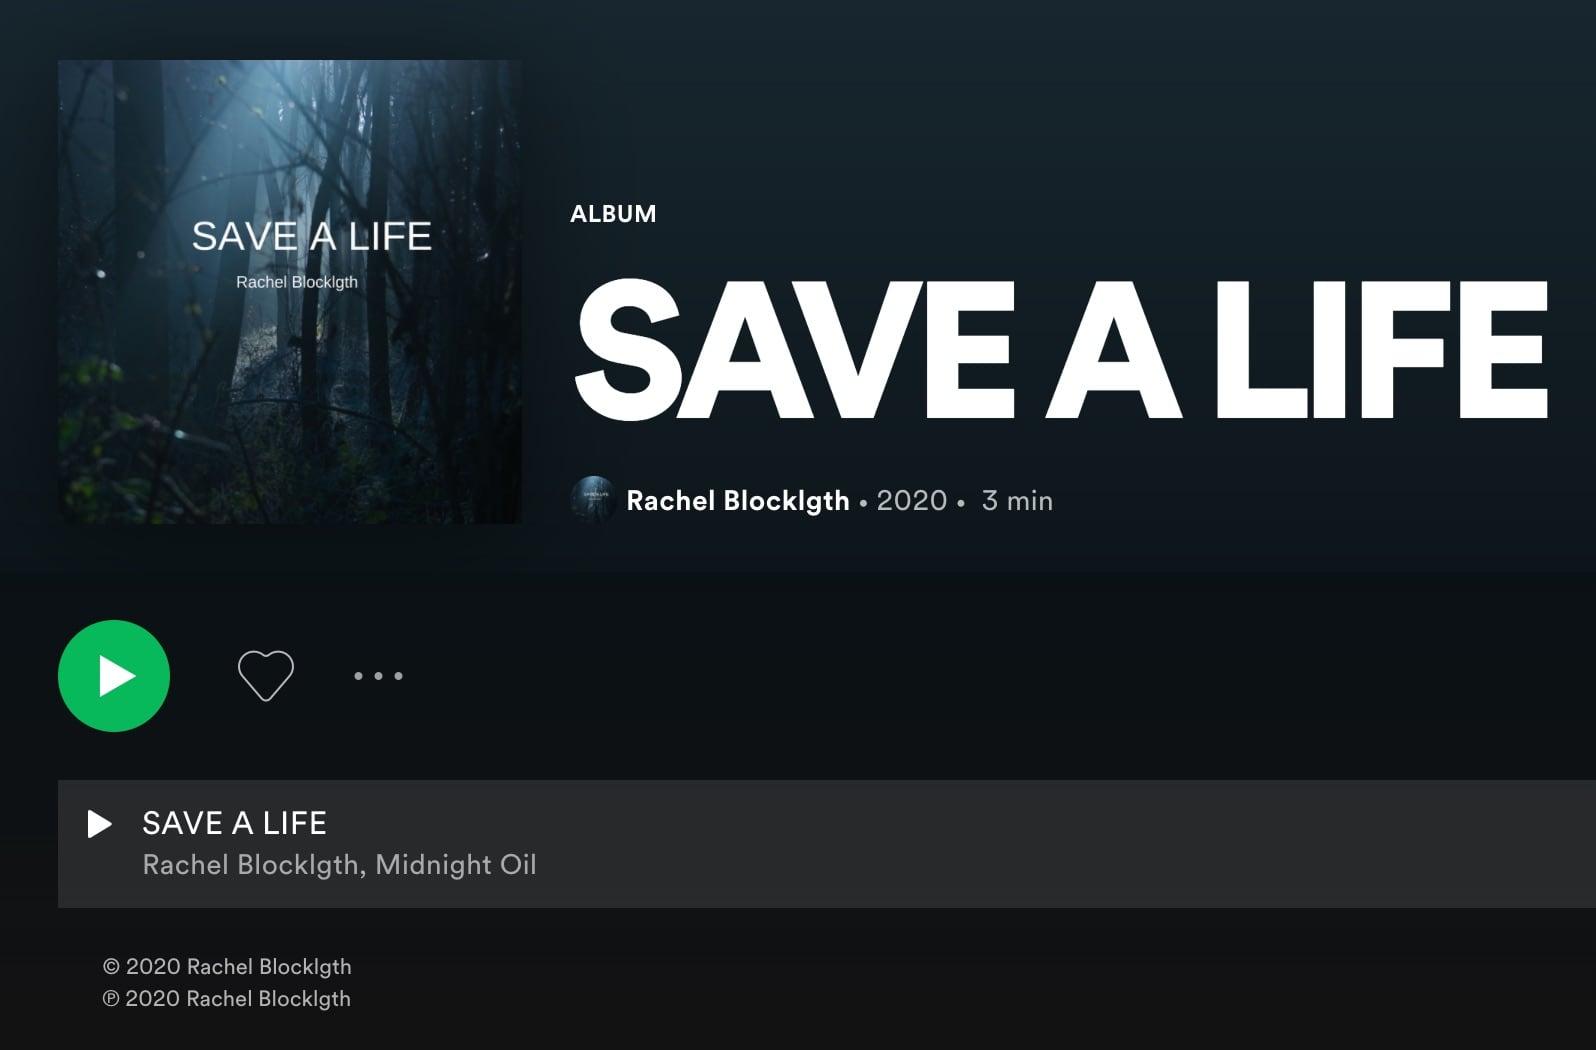 album screenshot